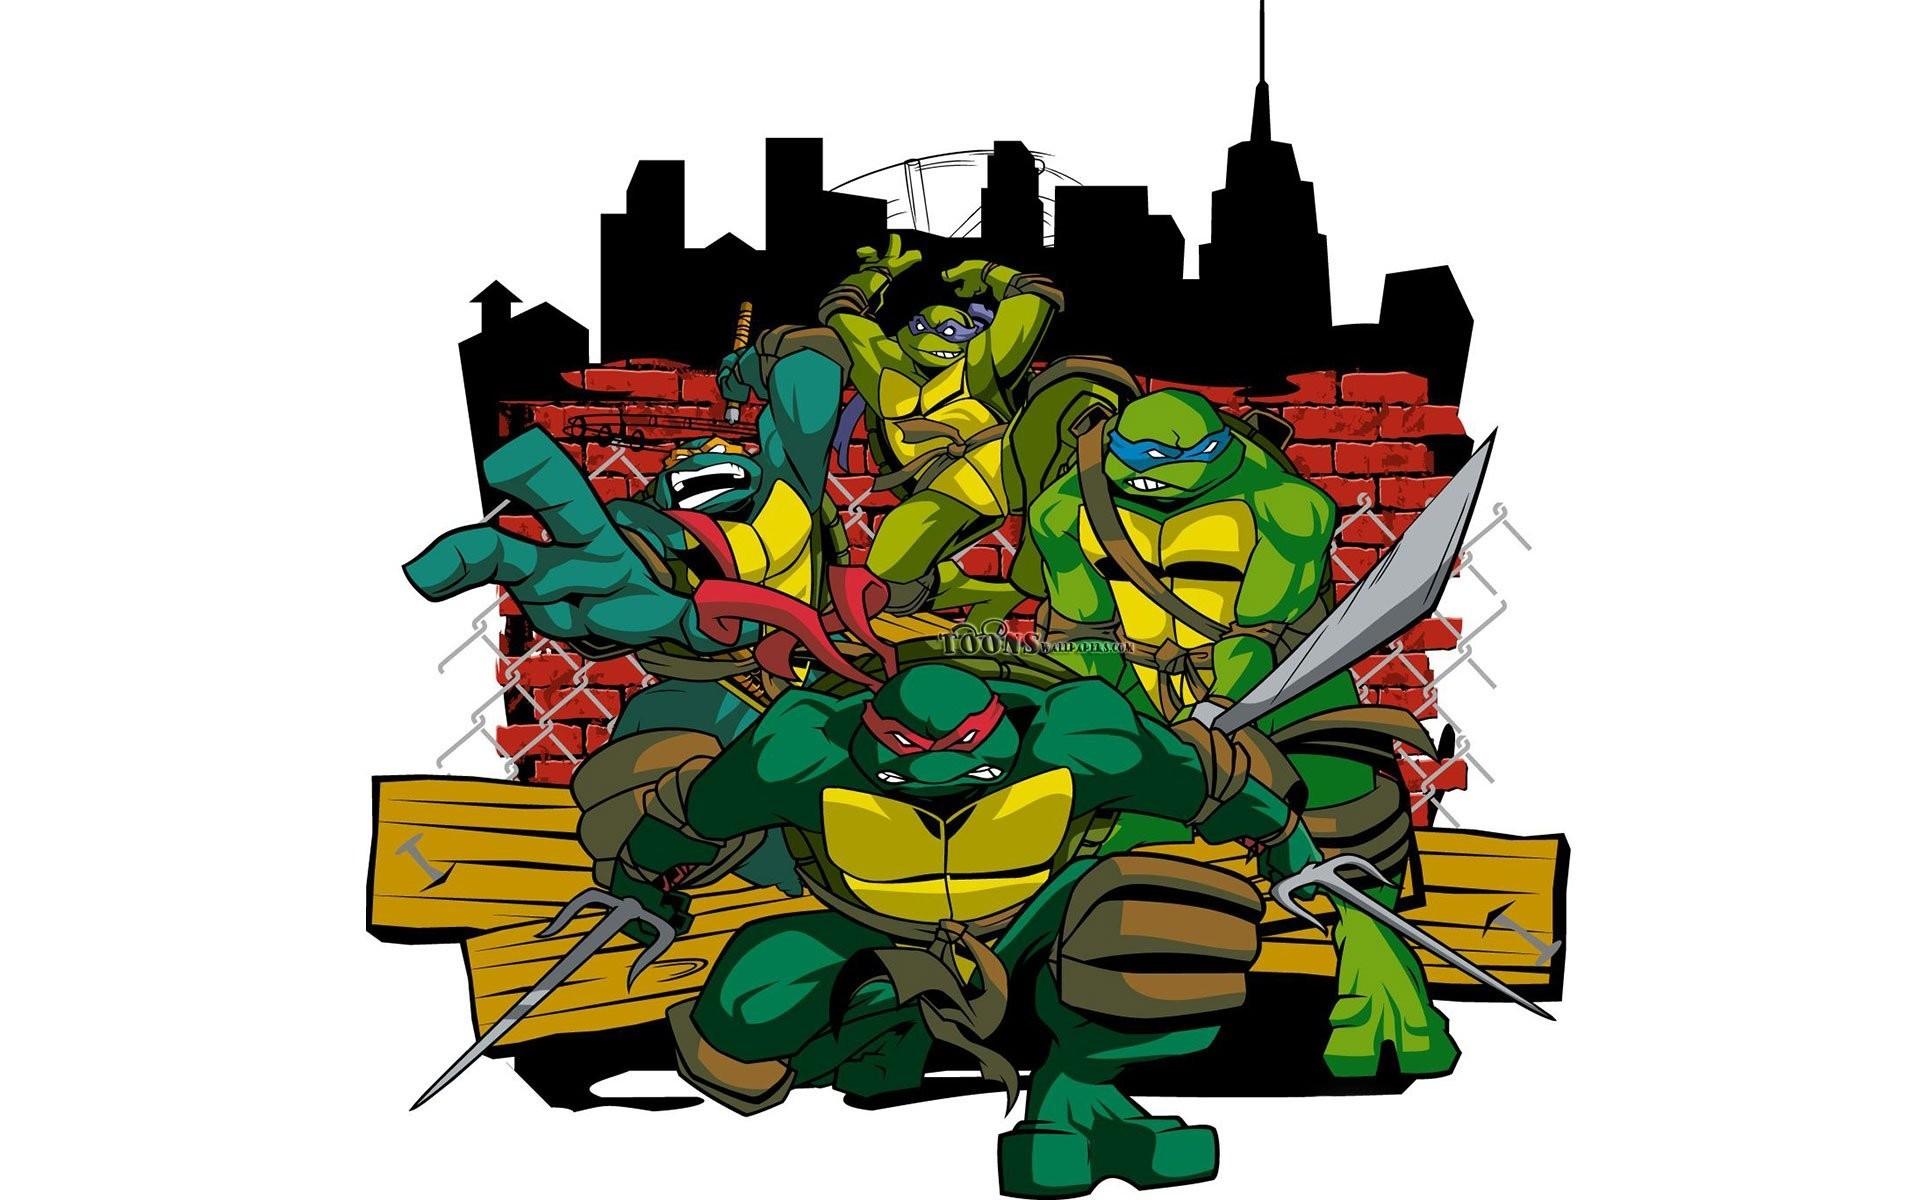 Res: 1920x1200, Movies Wallpaper. Download the following Teenage Mutant Ninja Turtles ...